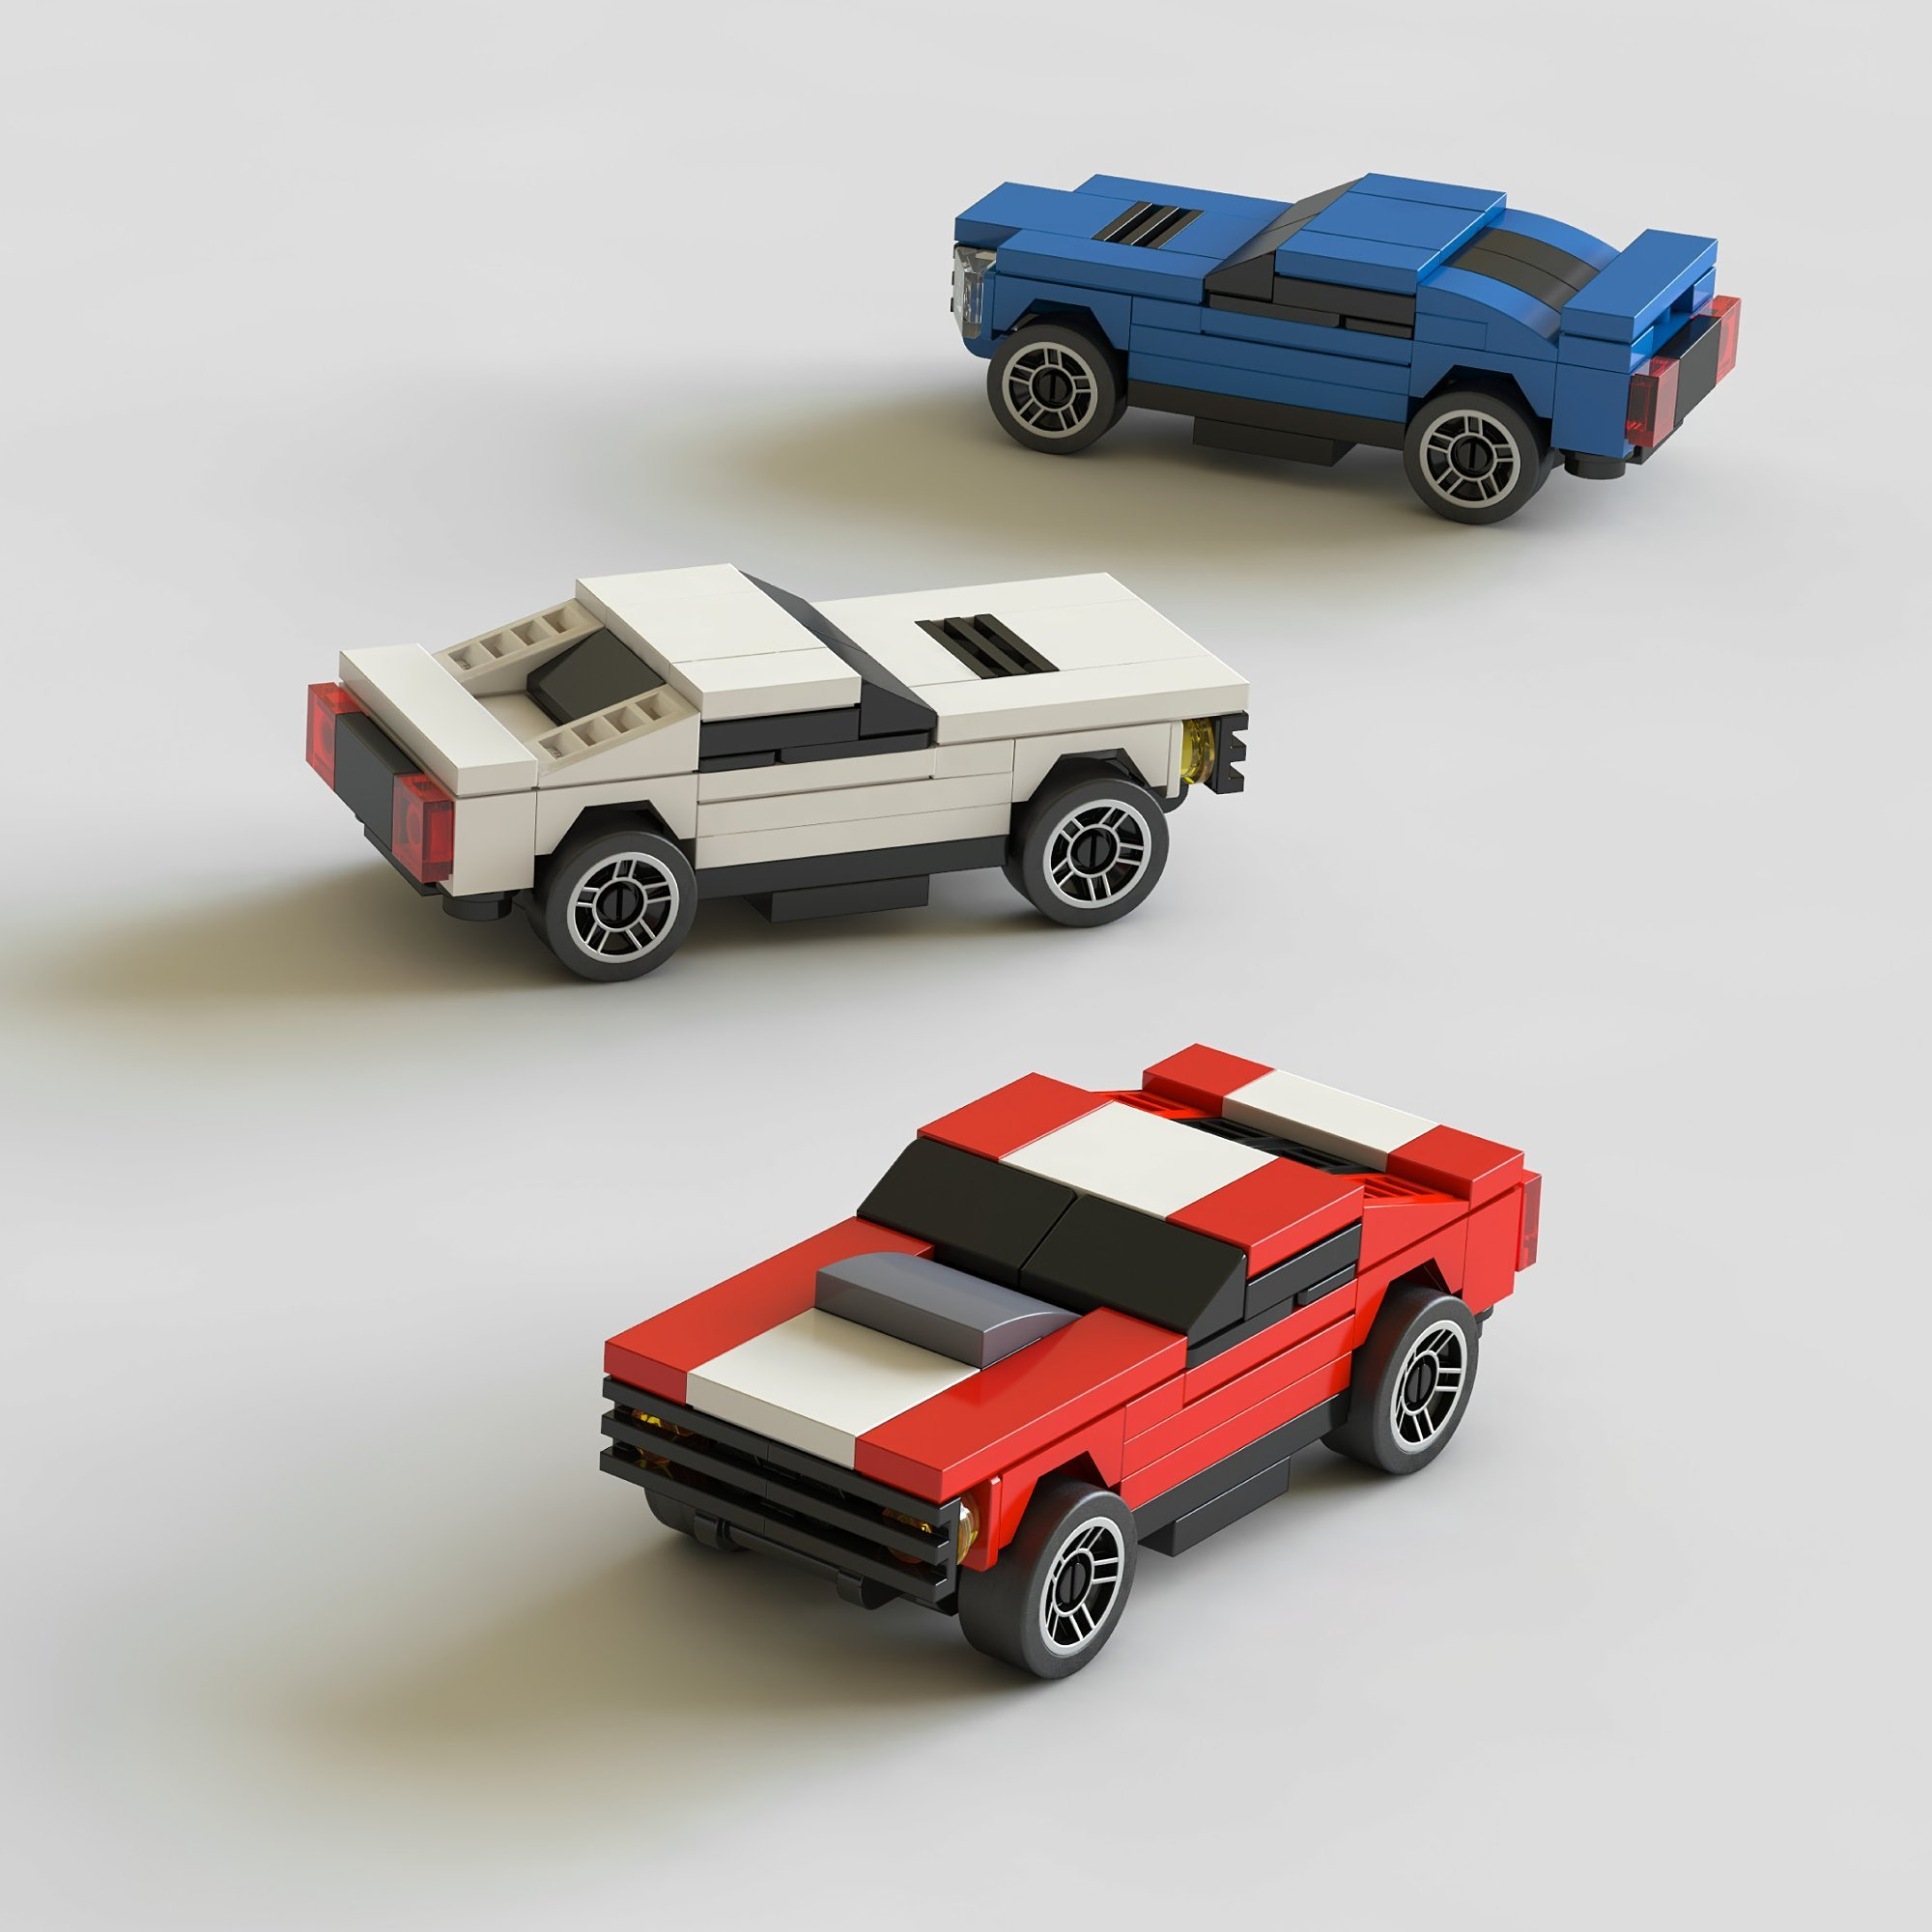 Tiny Lego Wonders Build 40 Surprisingly Realistic Mini Models